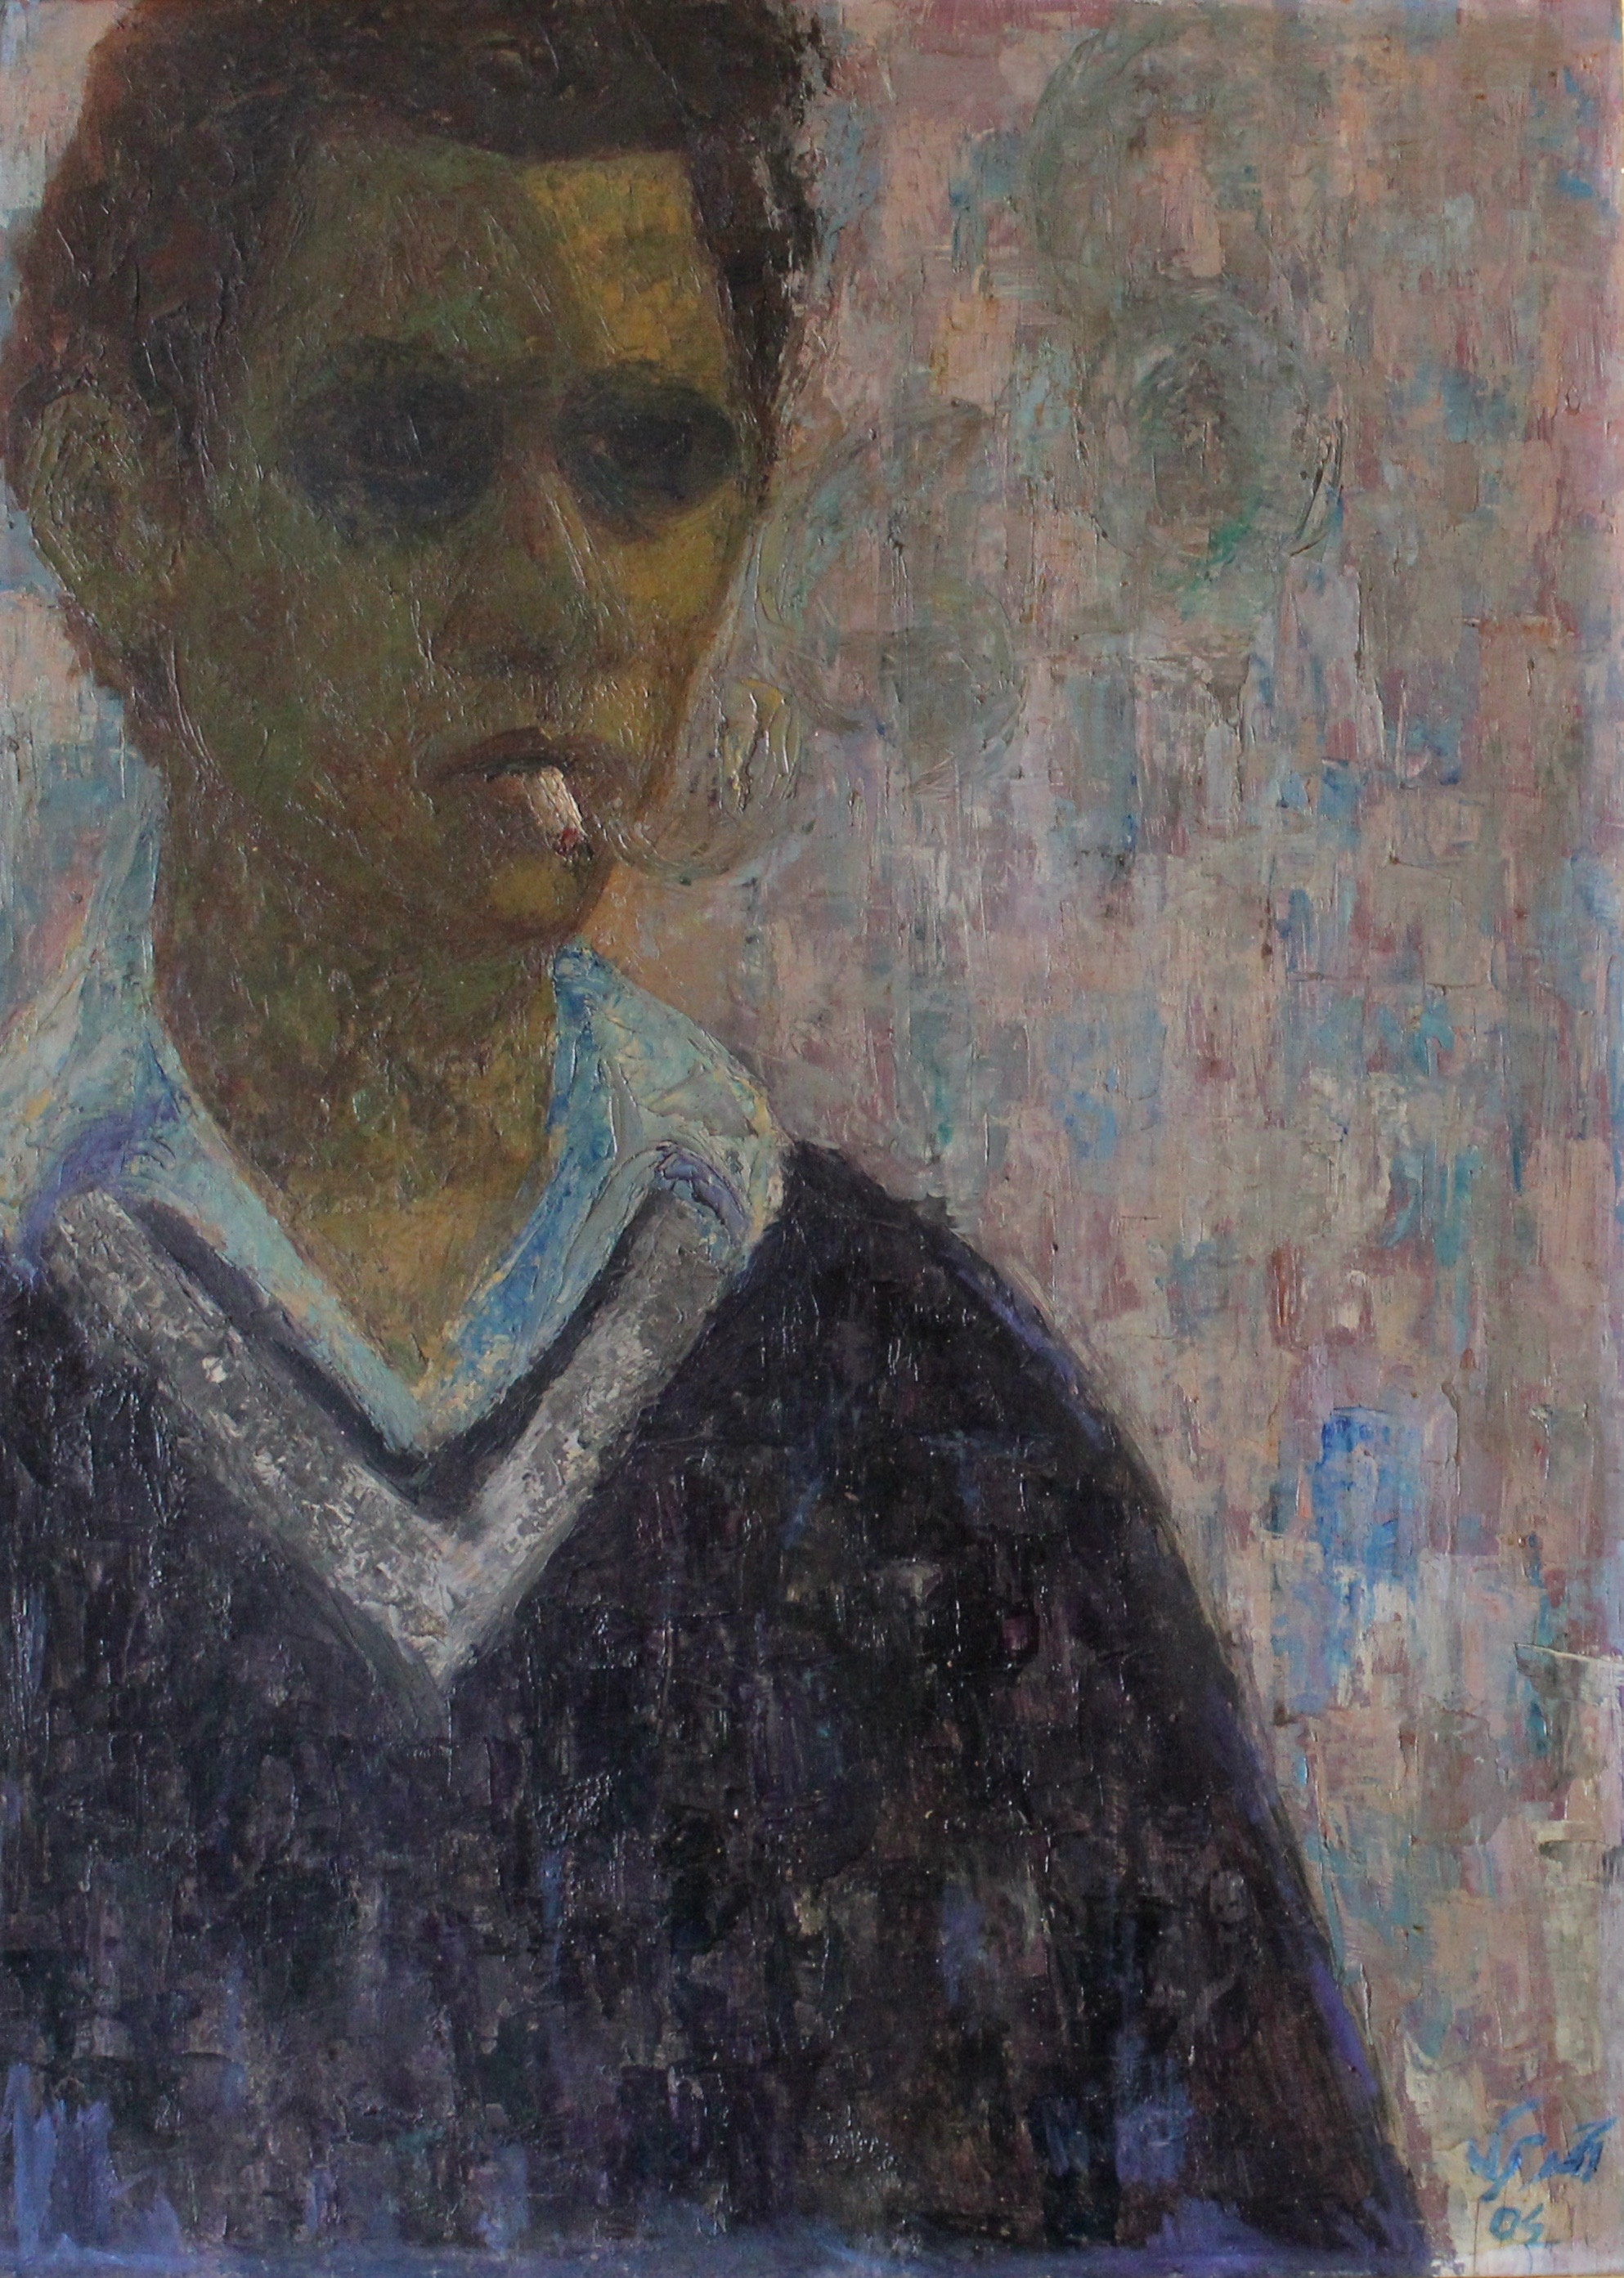 Sharjah Art Foundation Collection